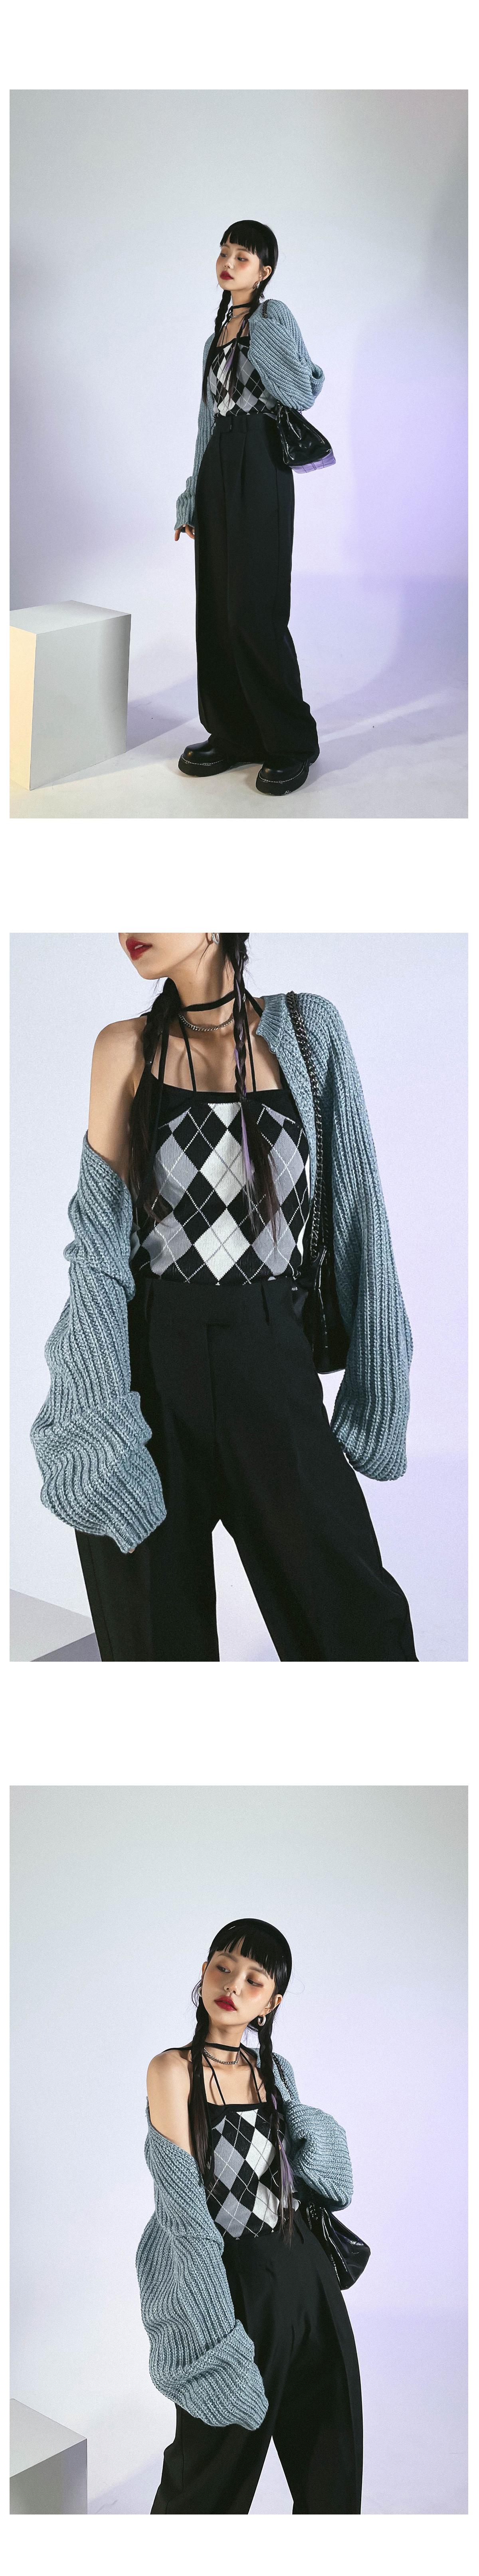 Argyle Quah Knitwear Bustier